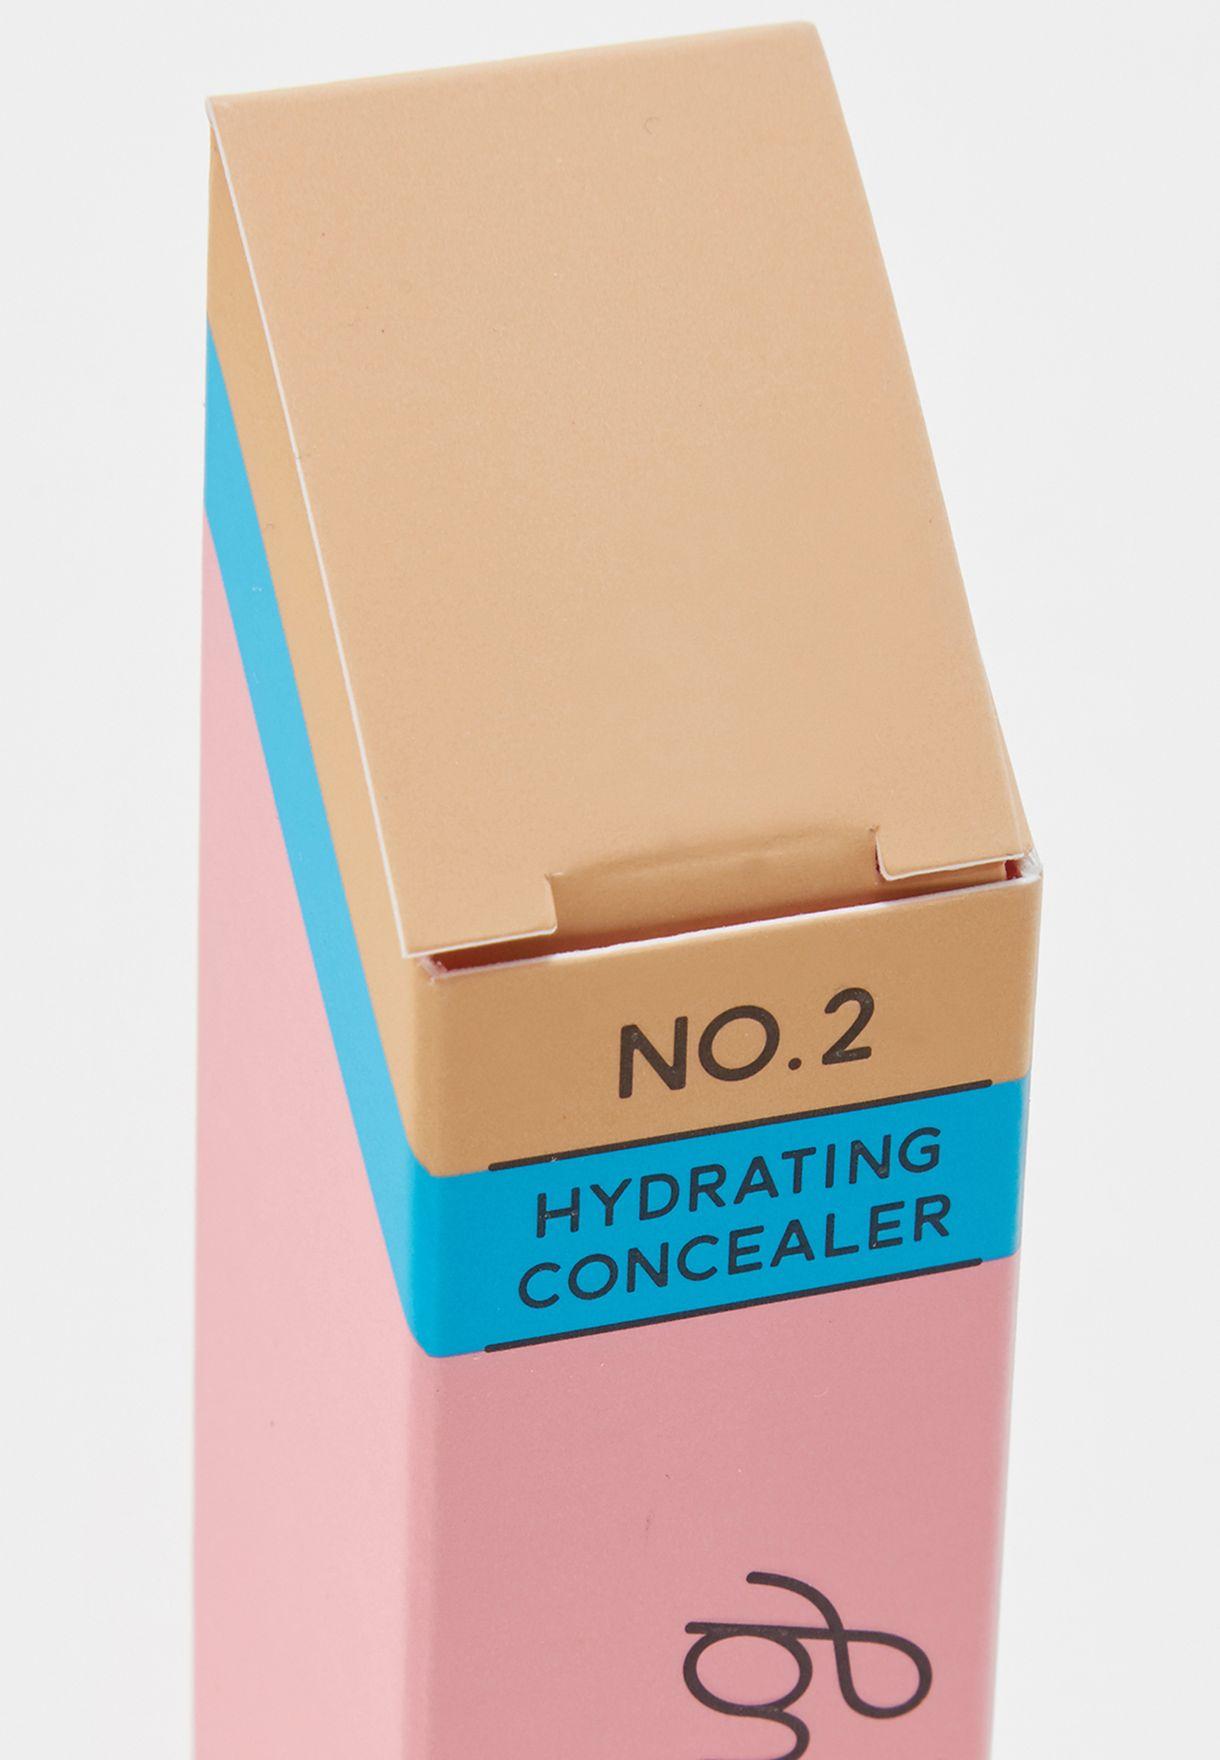 Boi-Ing Hydrating Concealer 02